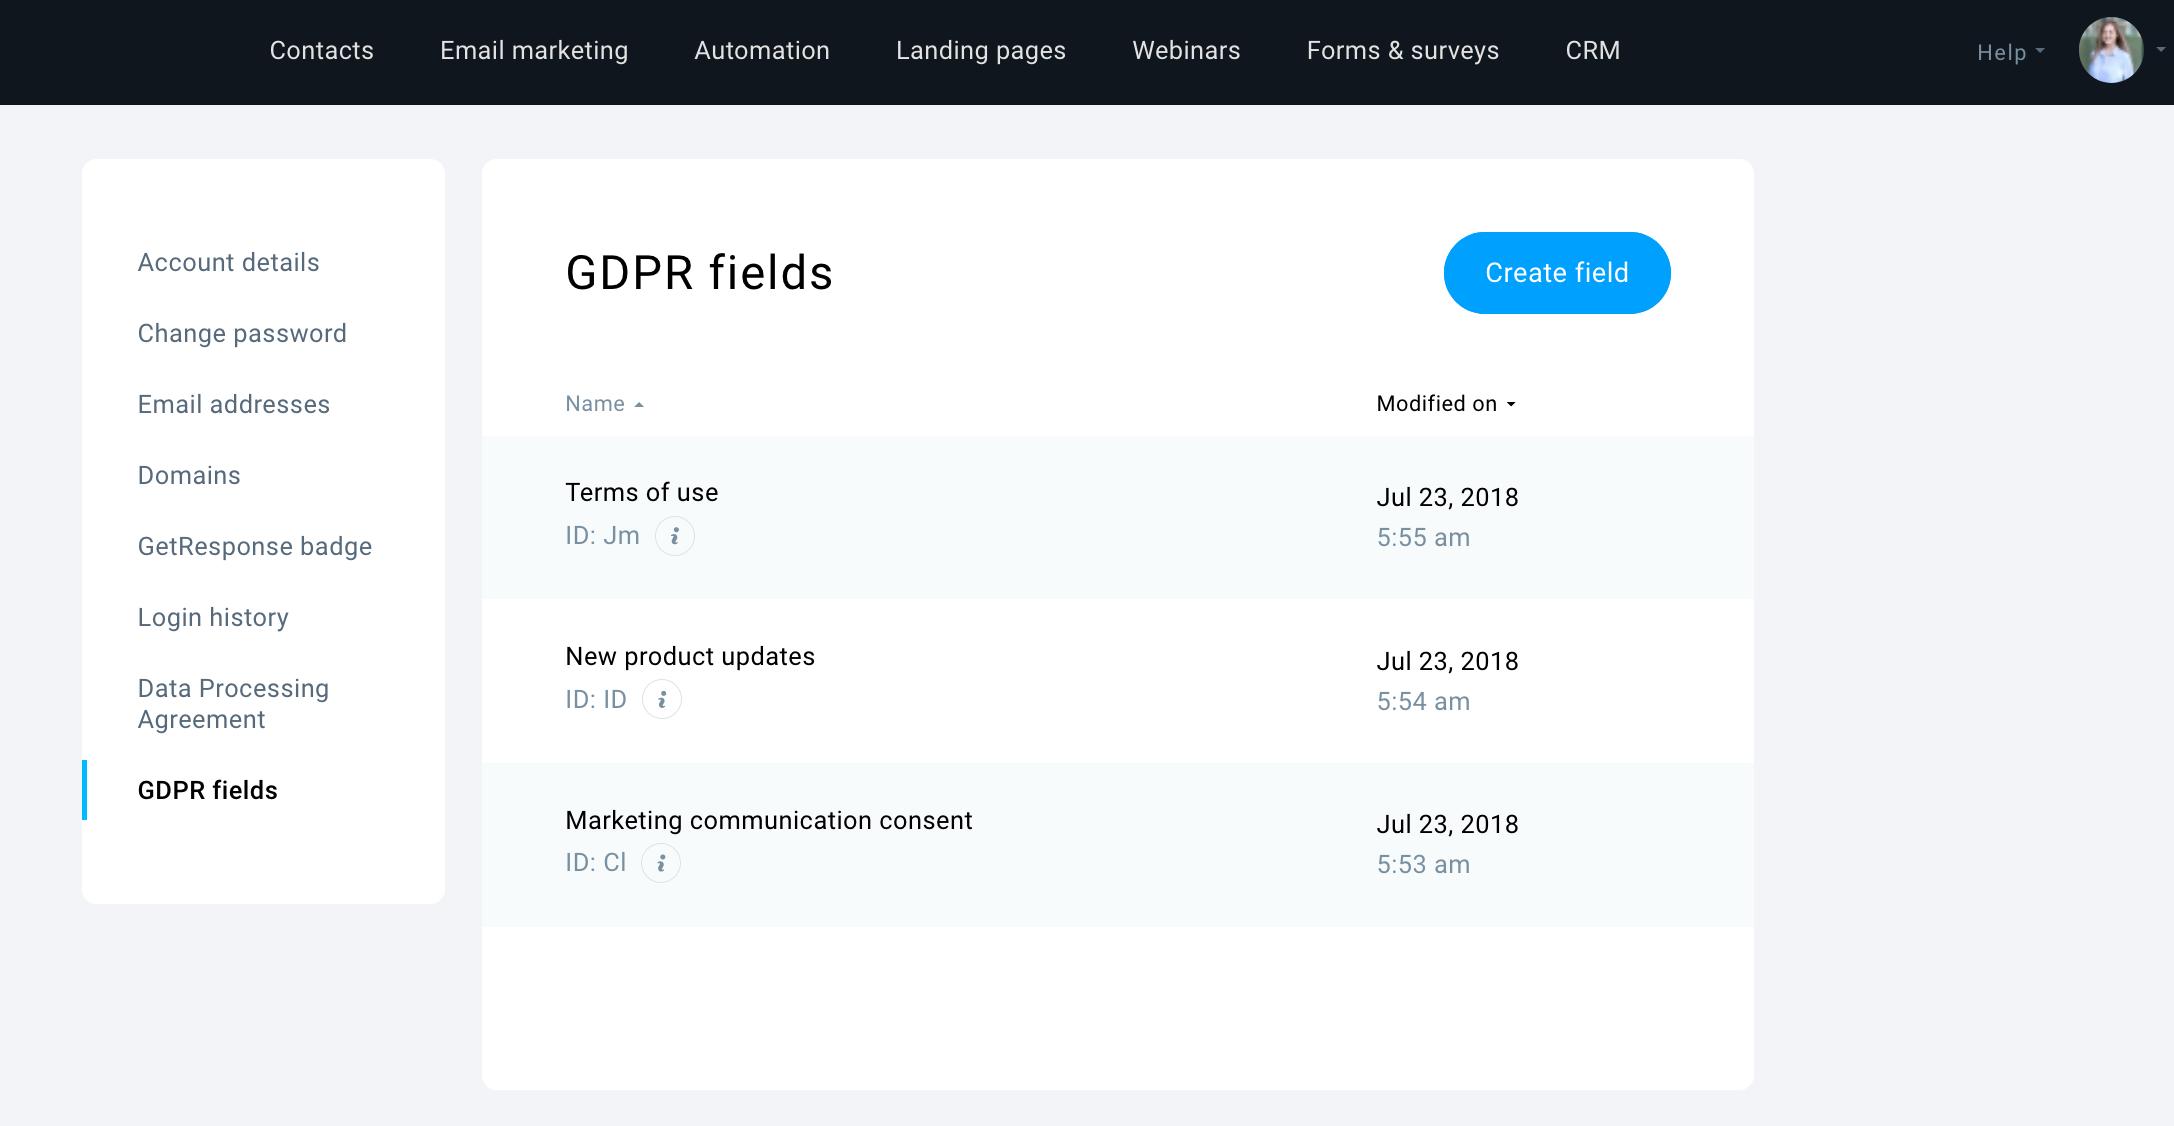 Manage GDPR fields GetResponse